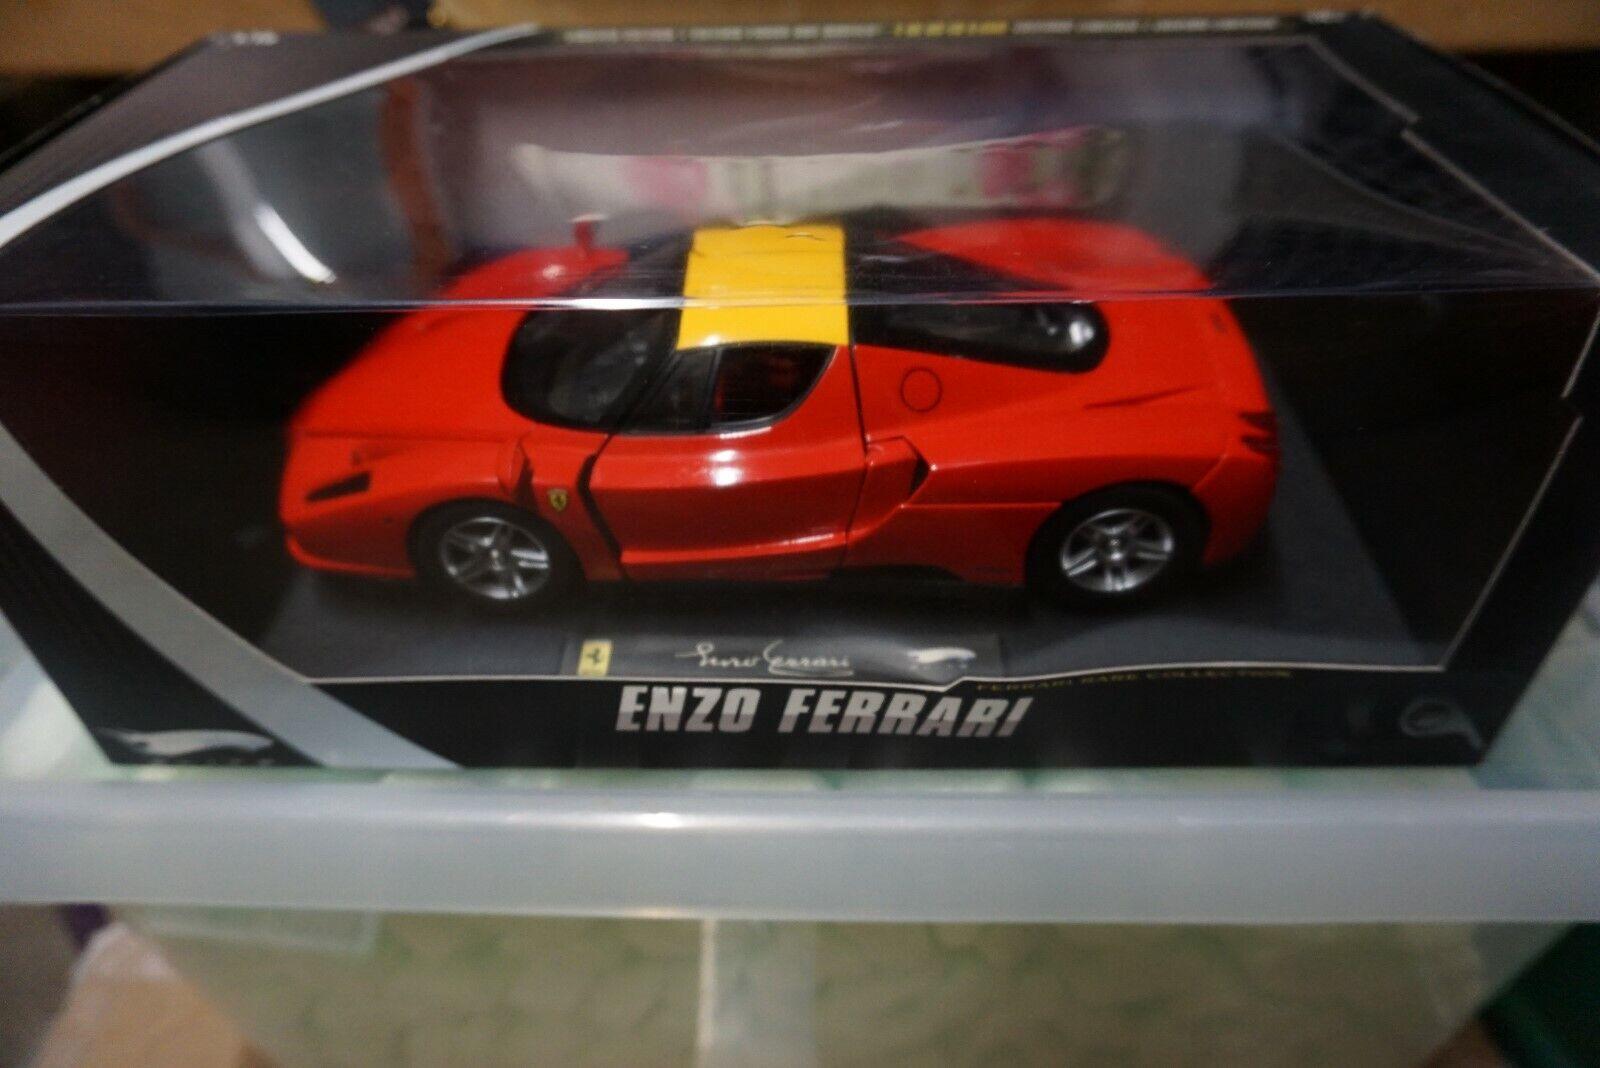 1 18 Hot Wtalons Elite Ferrari Enzo rouge  with jaune Roof  marque